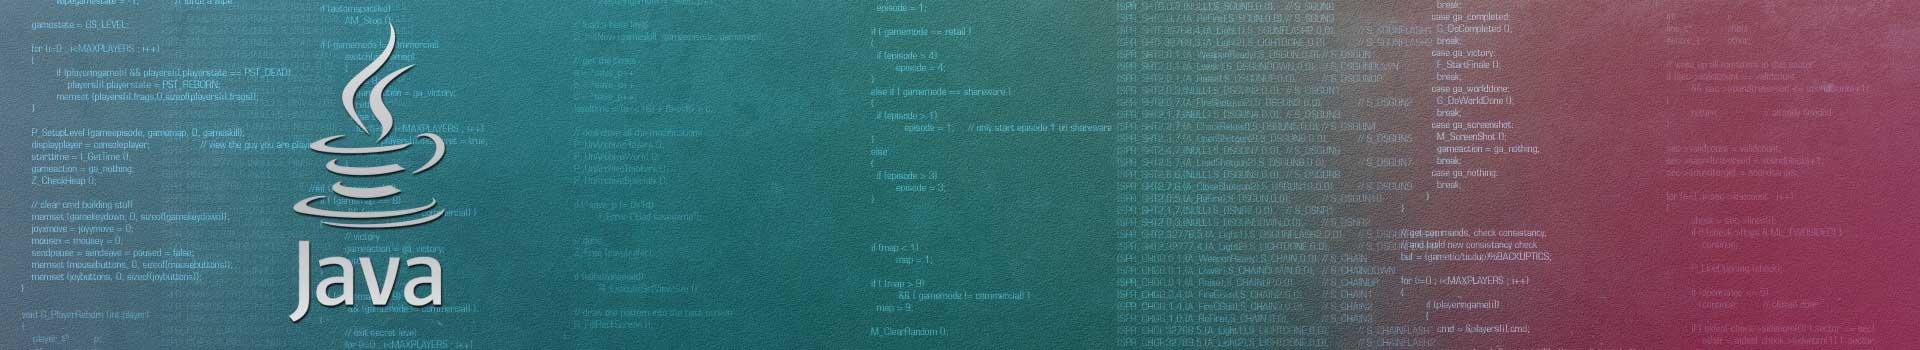 Sviluppatore Java Enterprise